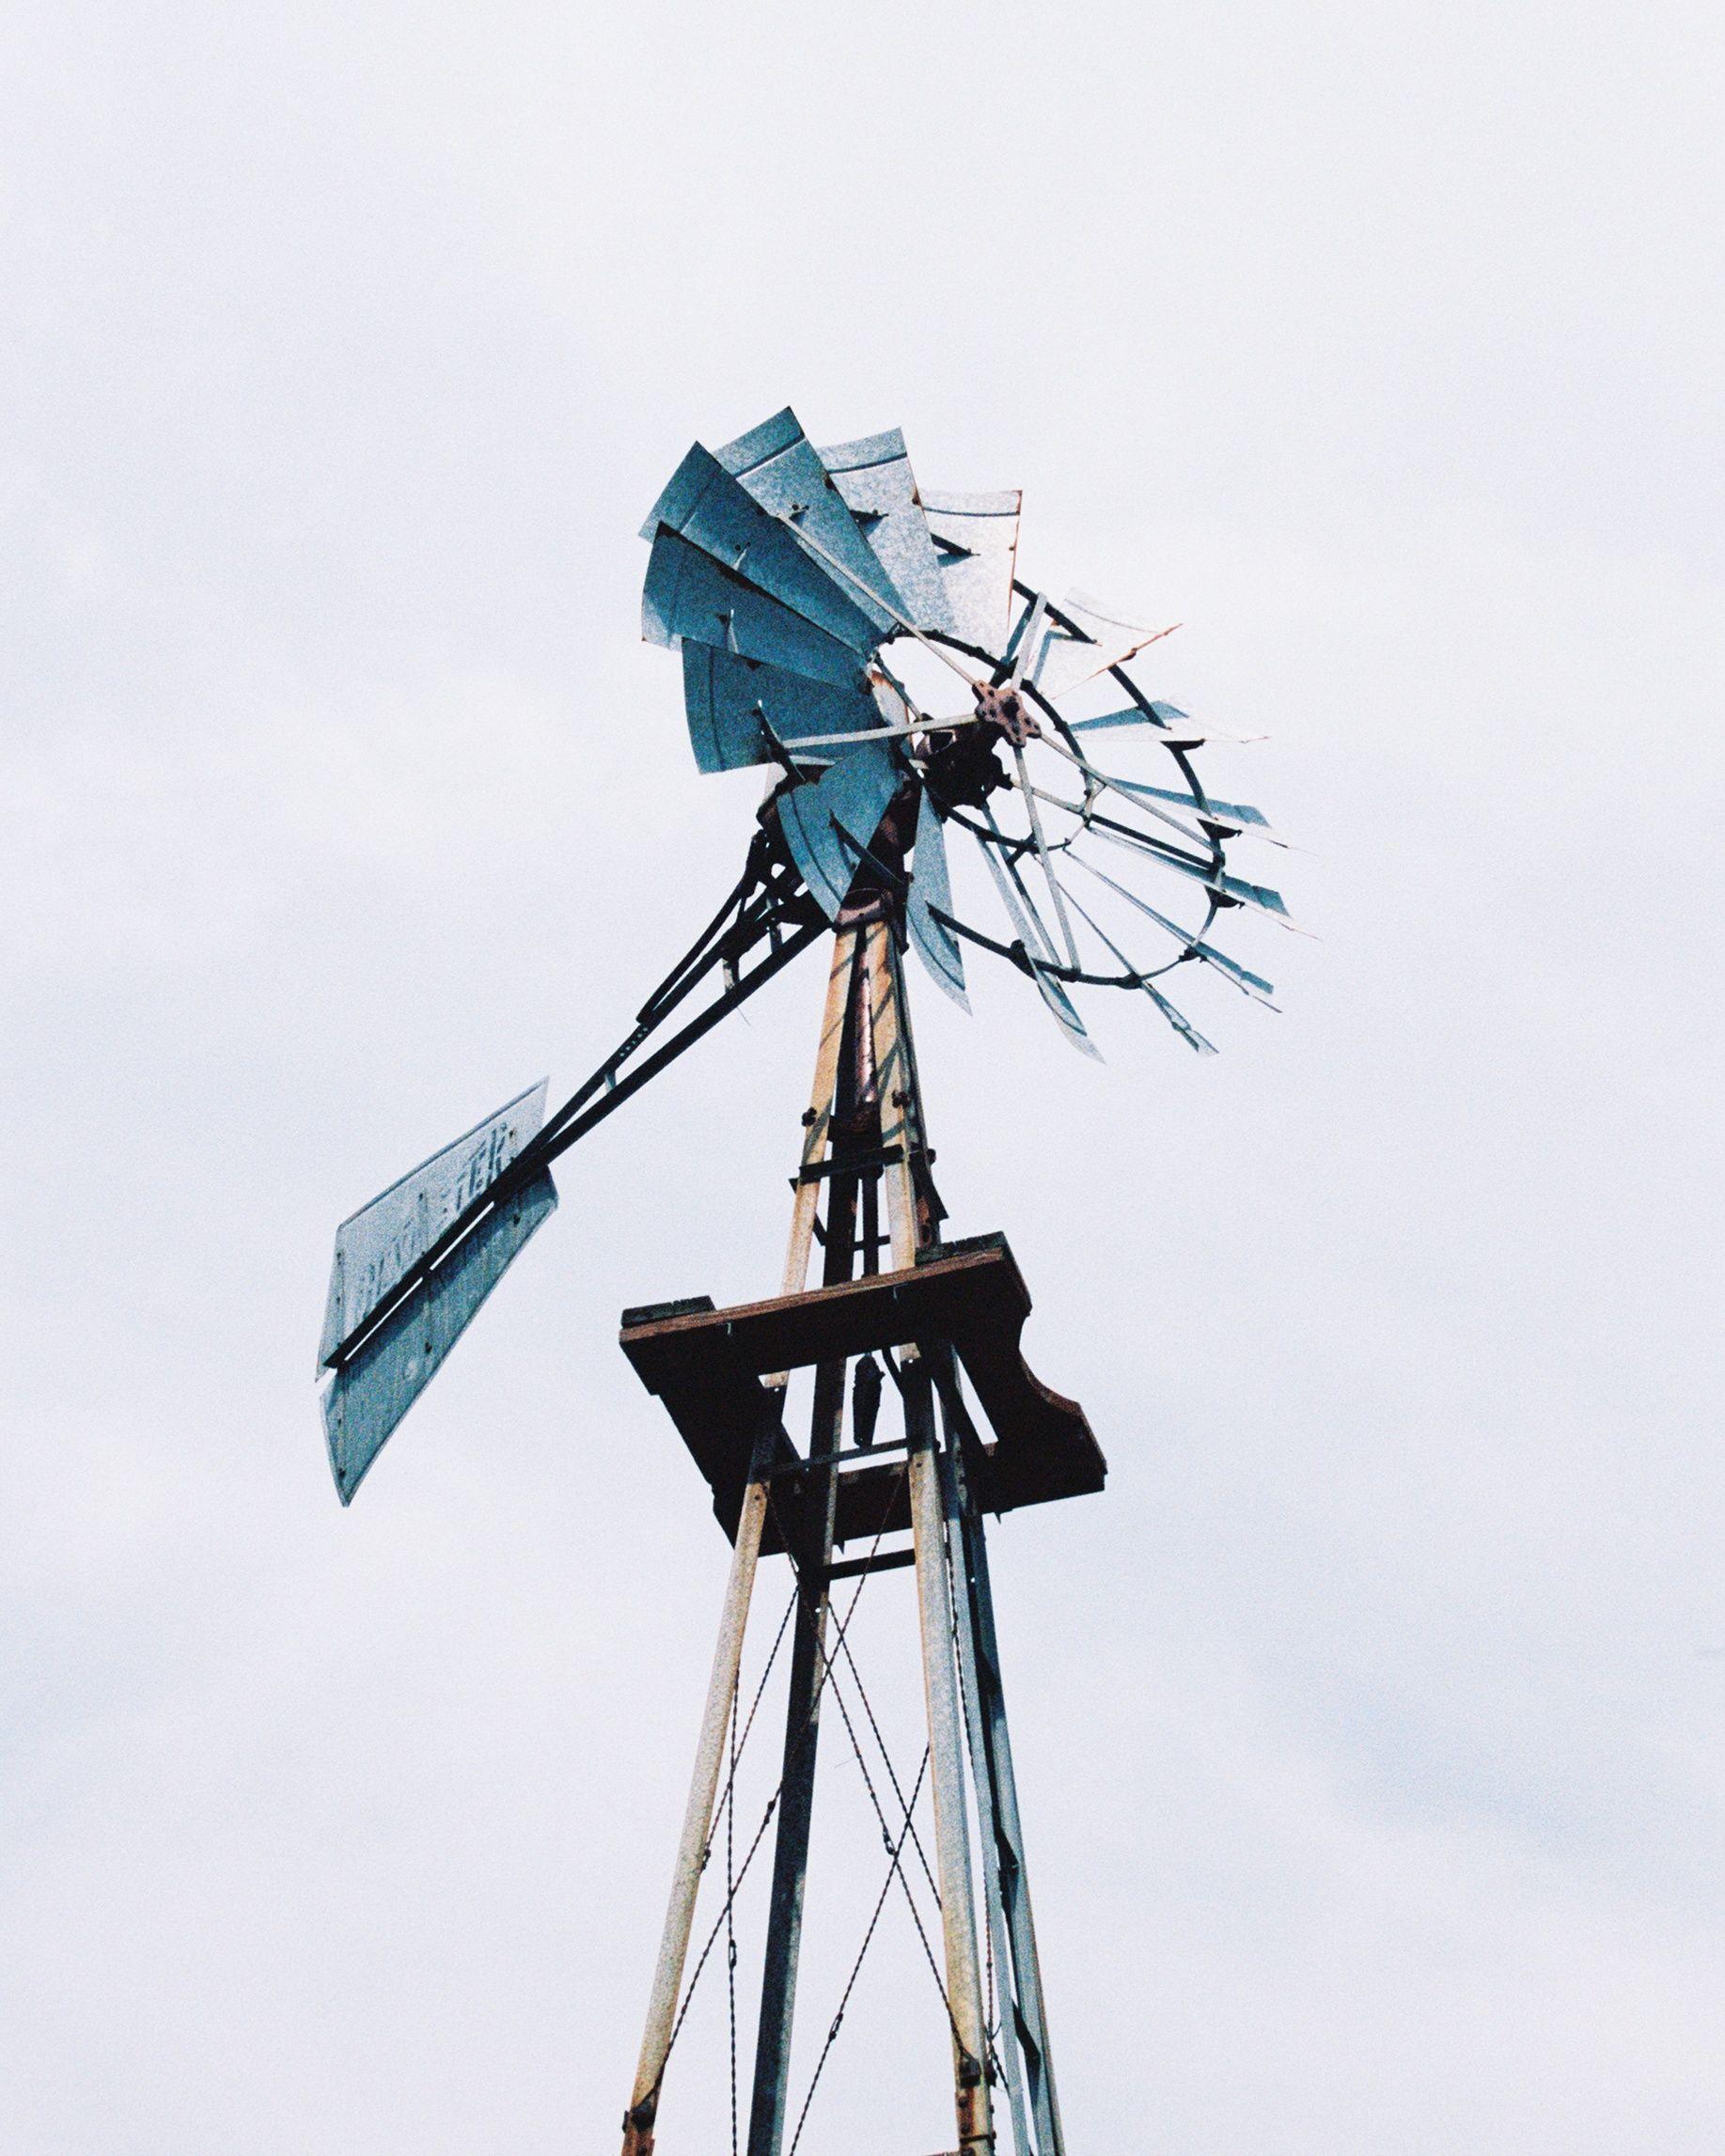 windmill Luis Lopez Photography.jpg